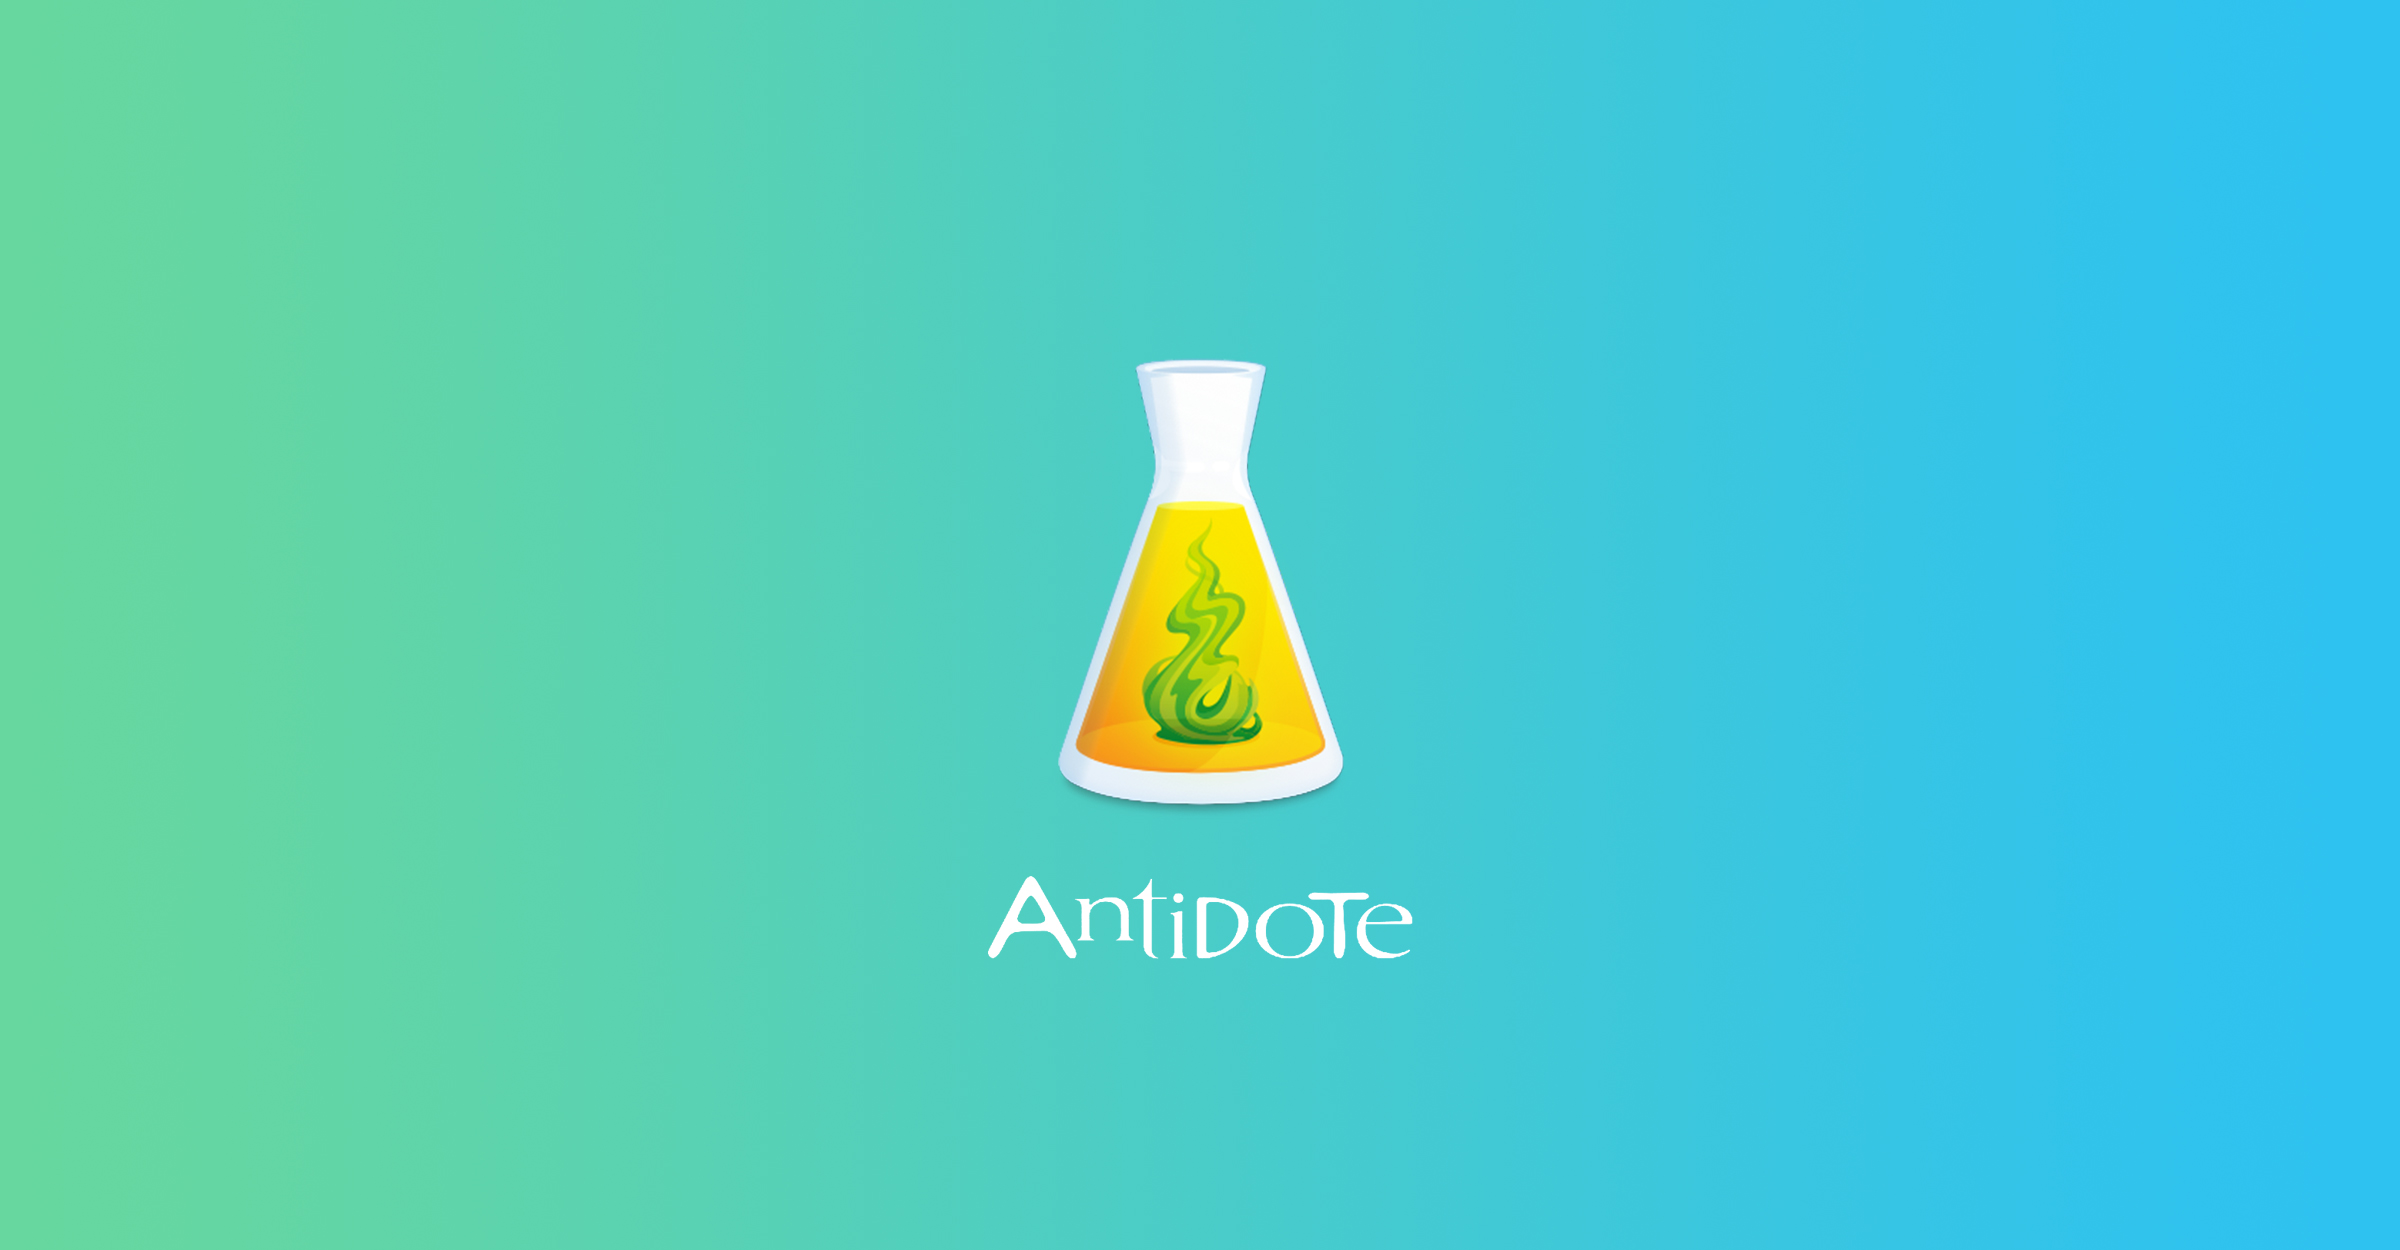 visuel comm antidote